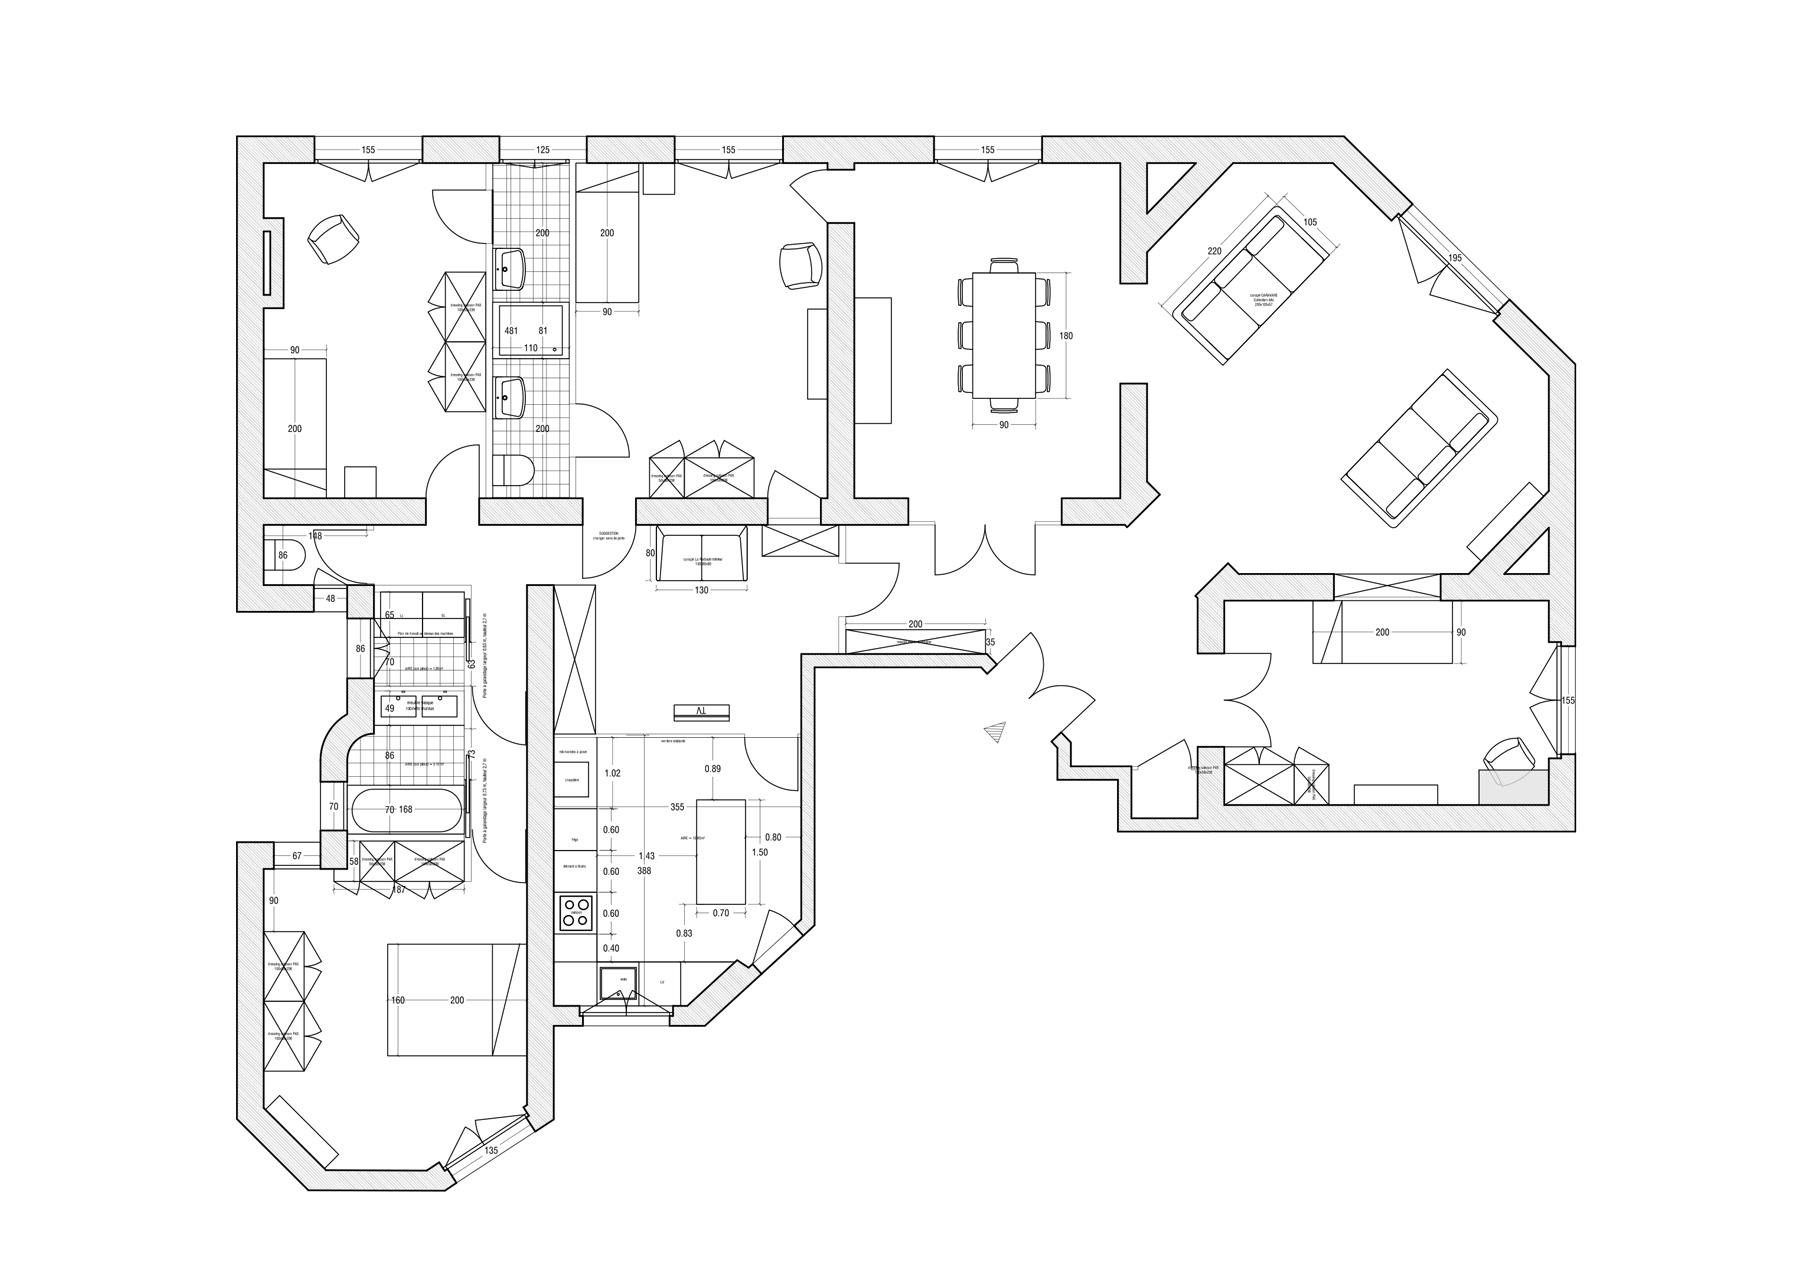 20150921_villebois-plan-2